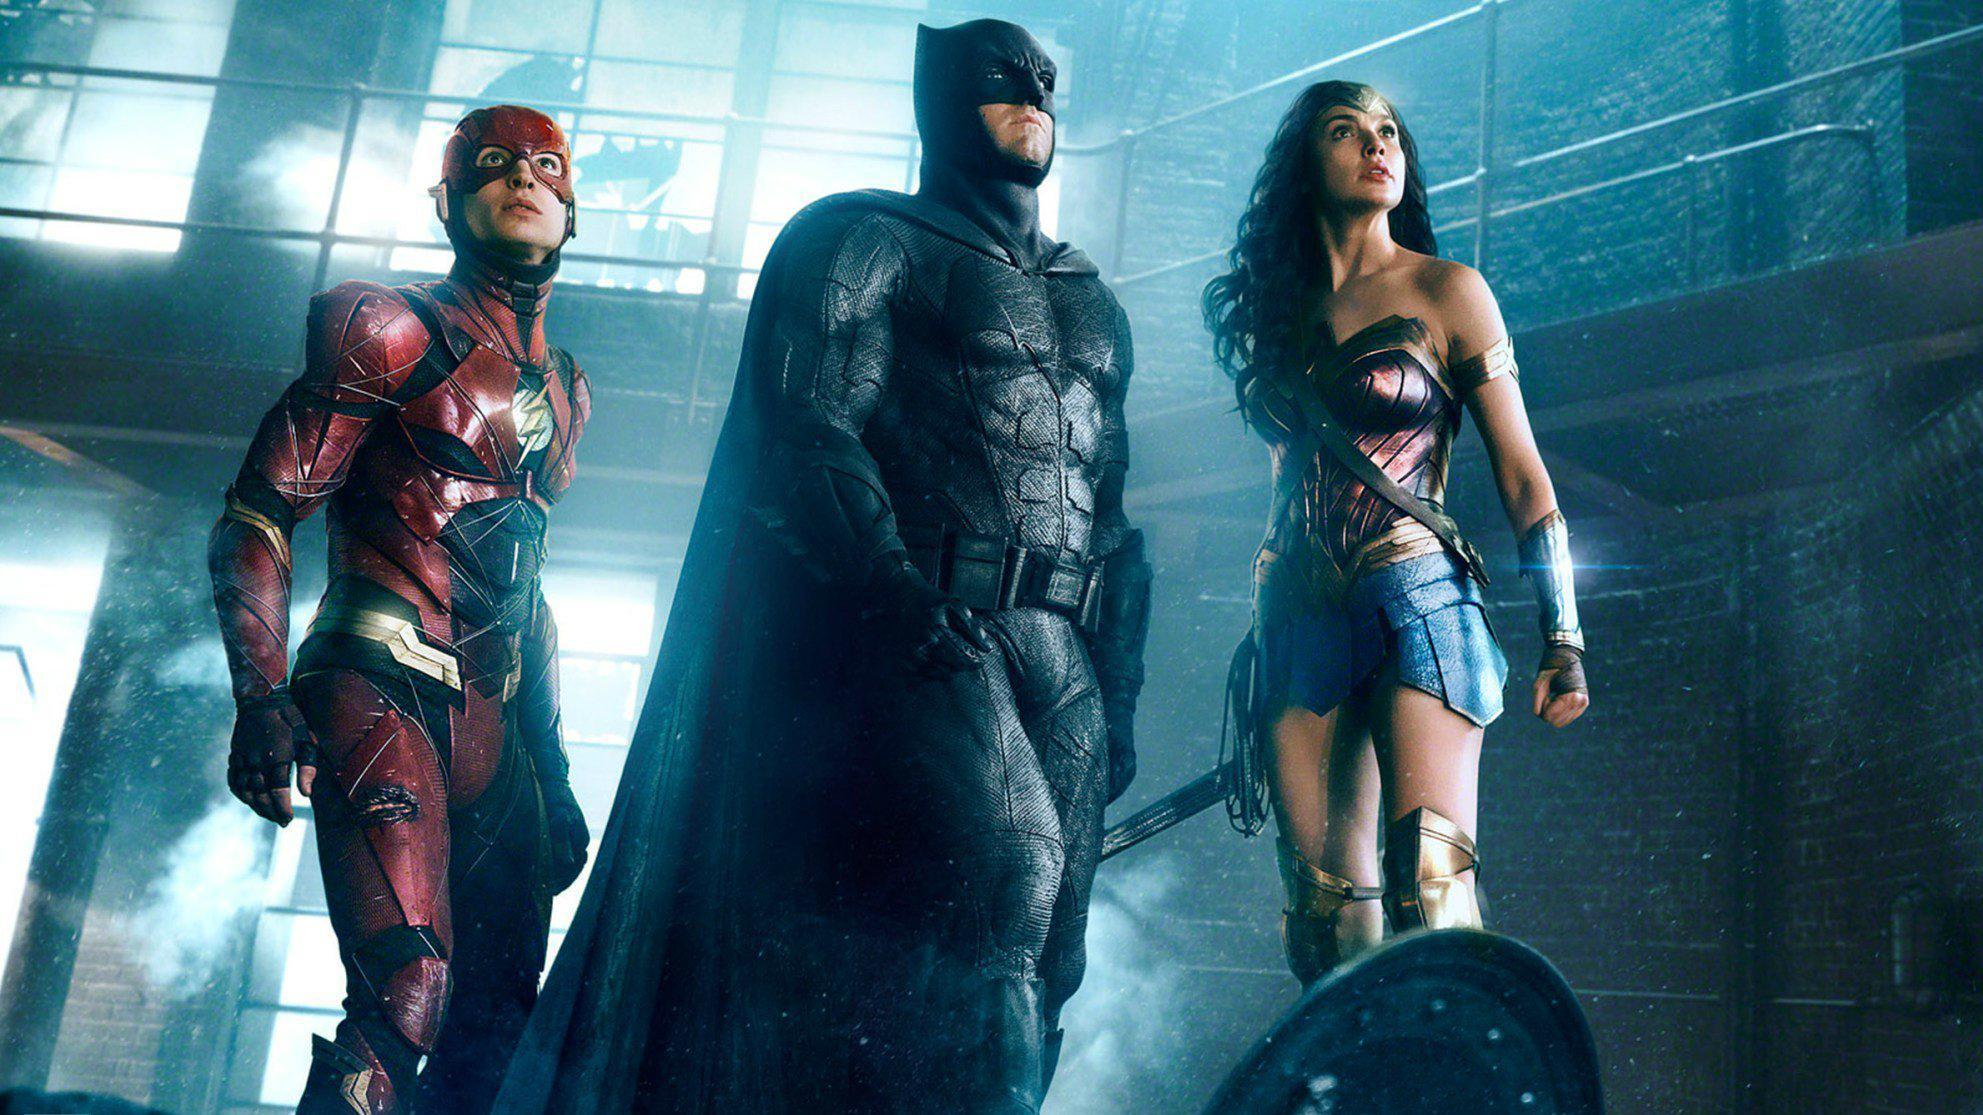 Justice League trailer hints at potential major villain